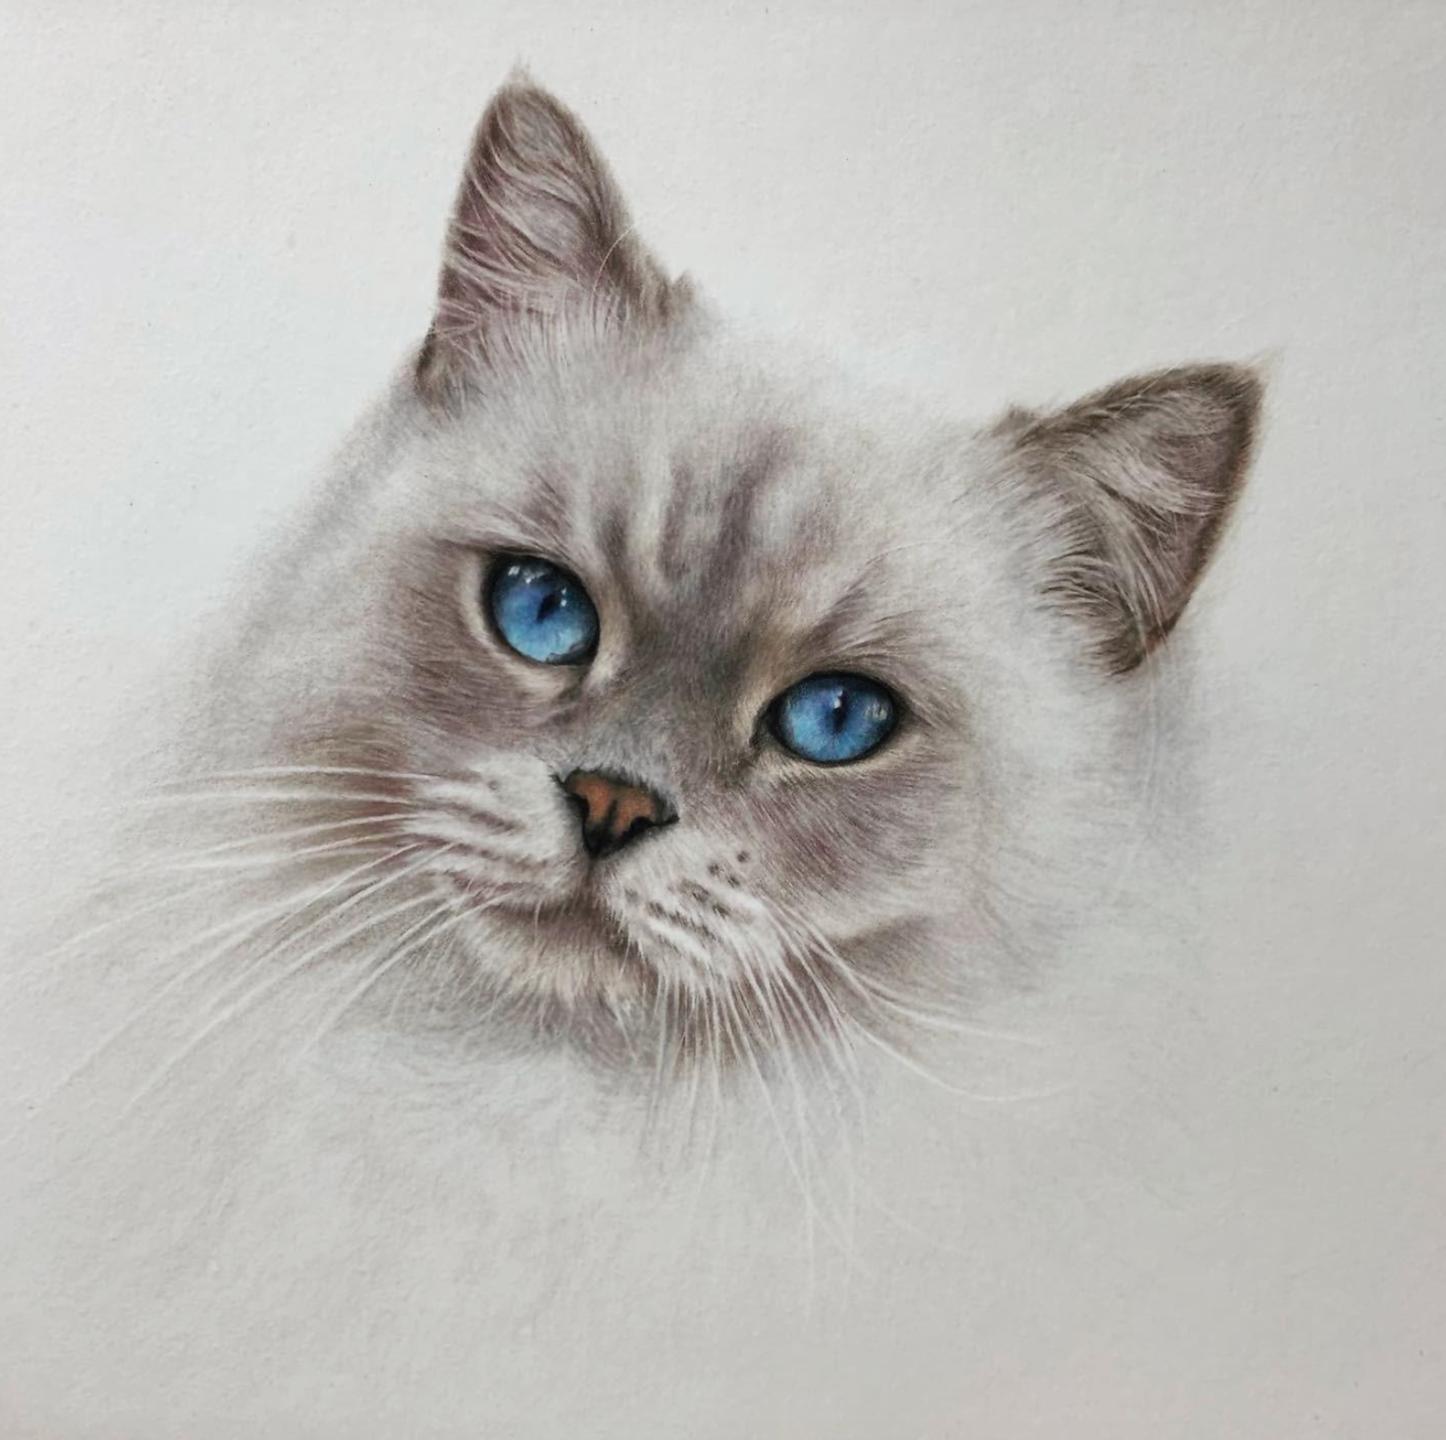 Fluffy Cat Focus - Patreon - Tutorial Gallery - Bonny Snowdon Fine Art